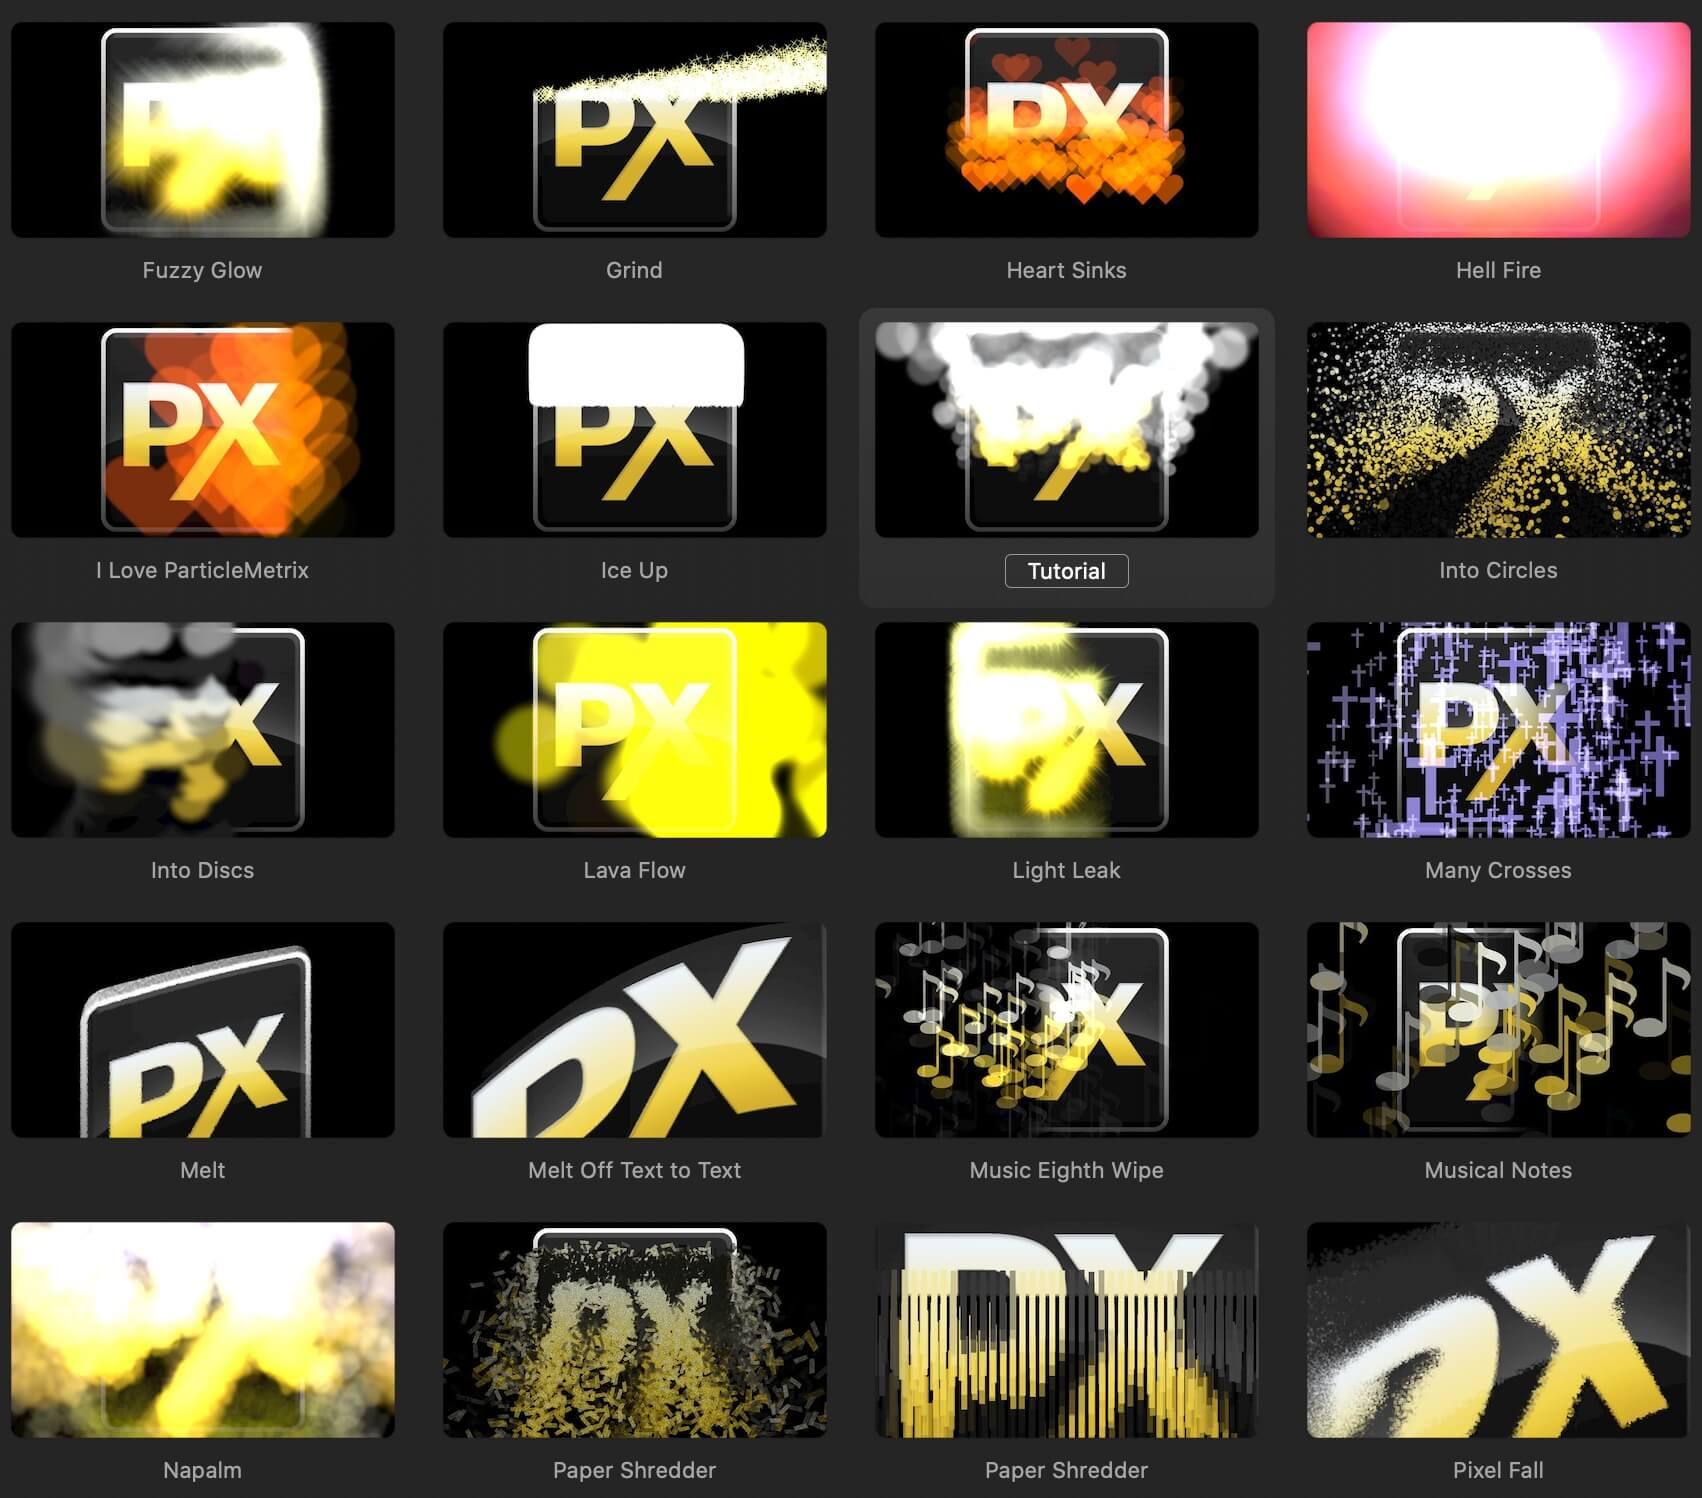 fcpx插件 55个视频图像文字添加粒子效果+21个粒子转场 ParticleMetrix